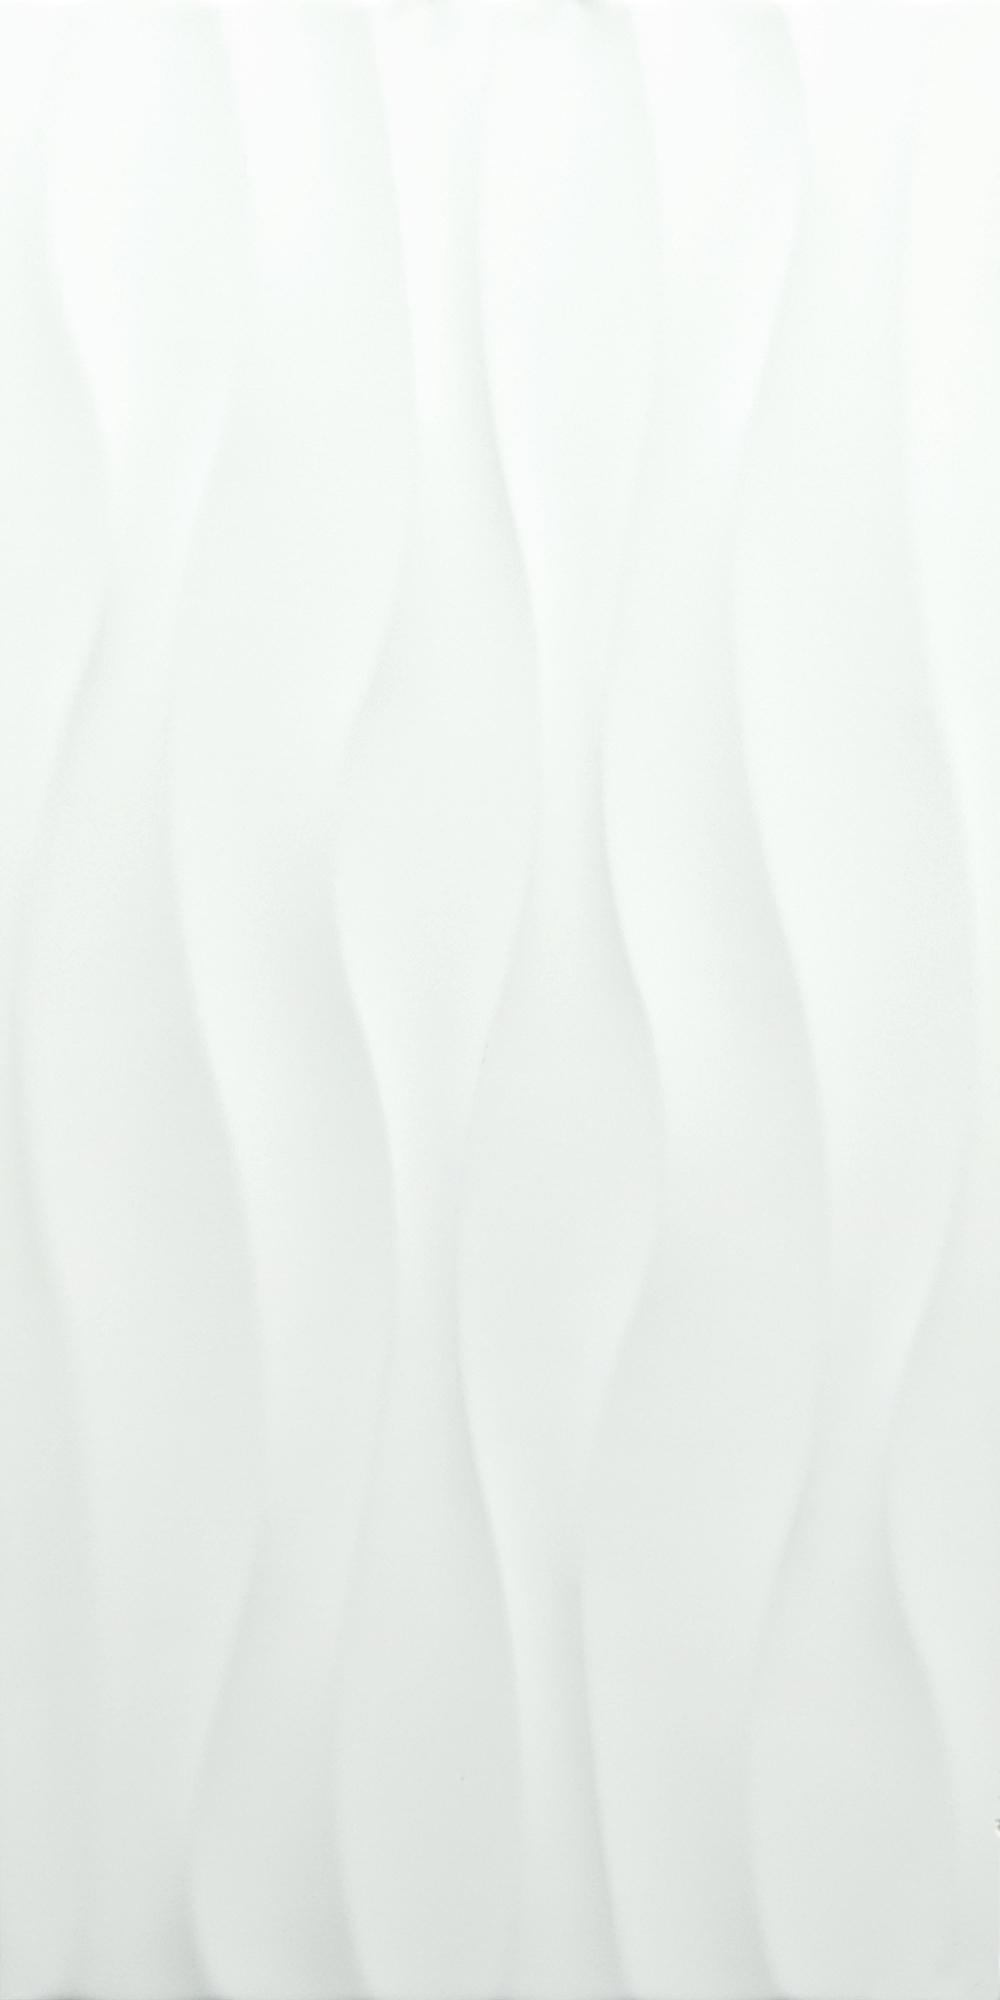 De Pared Amazing Reloj De Pared Horas With De Pared Elegant  # Muebles Tokaluz